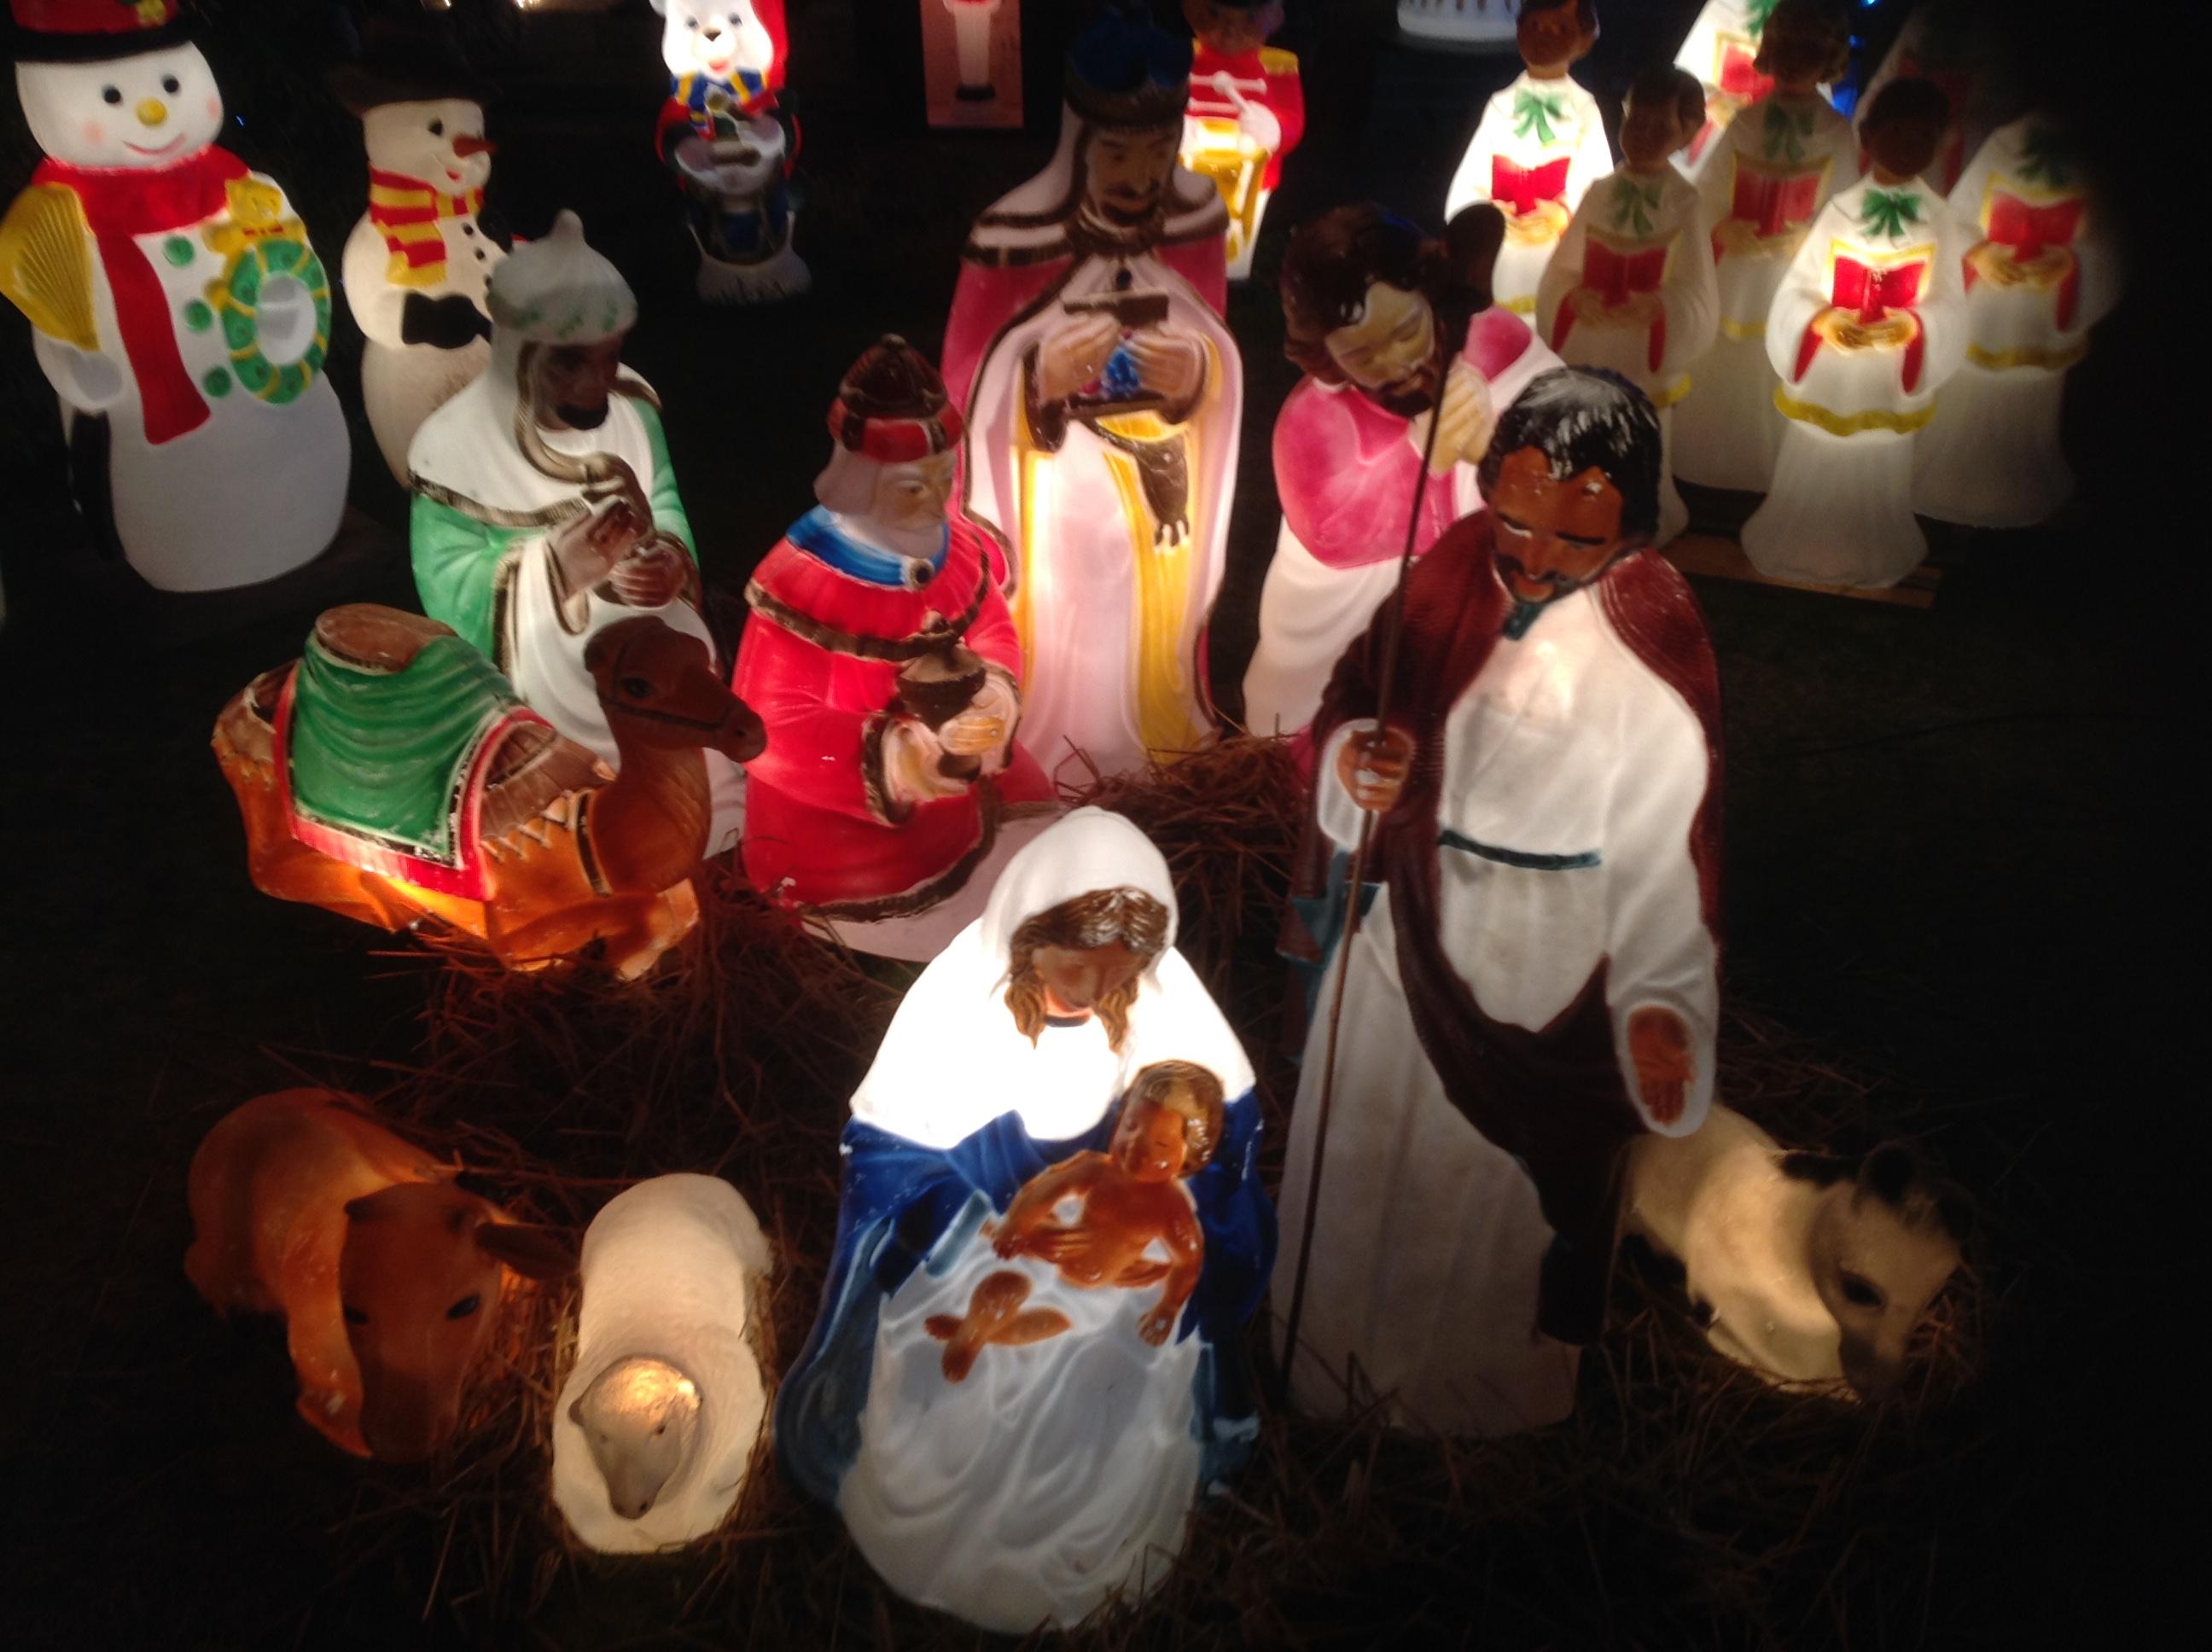 New Centrepiece - Nativity